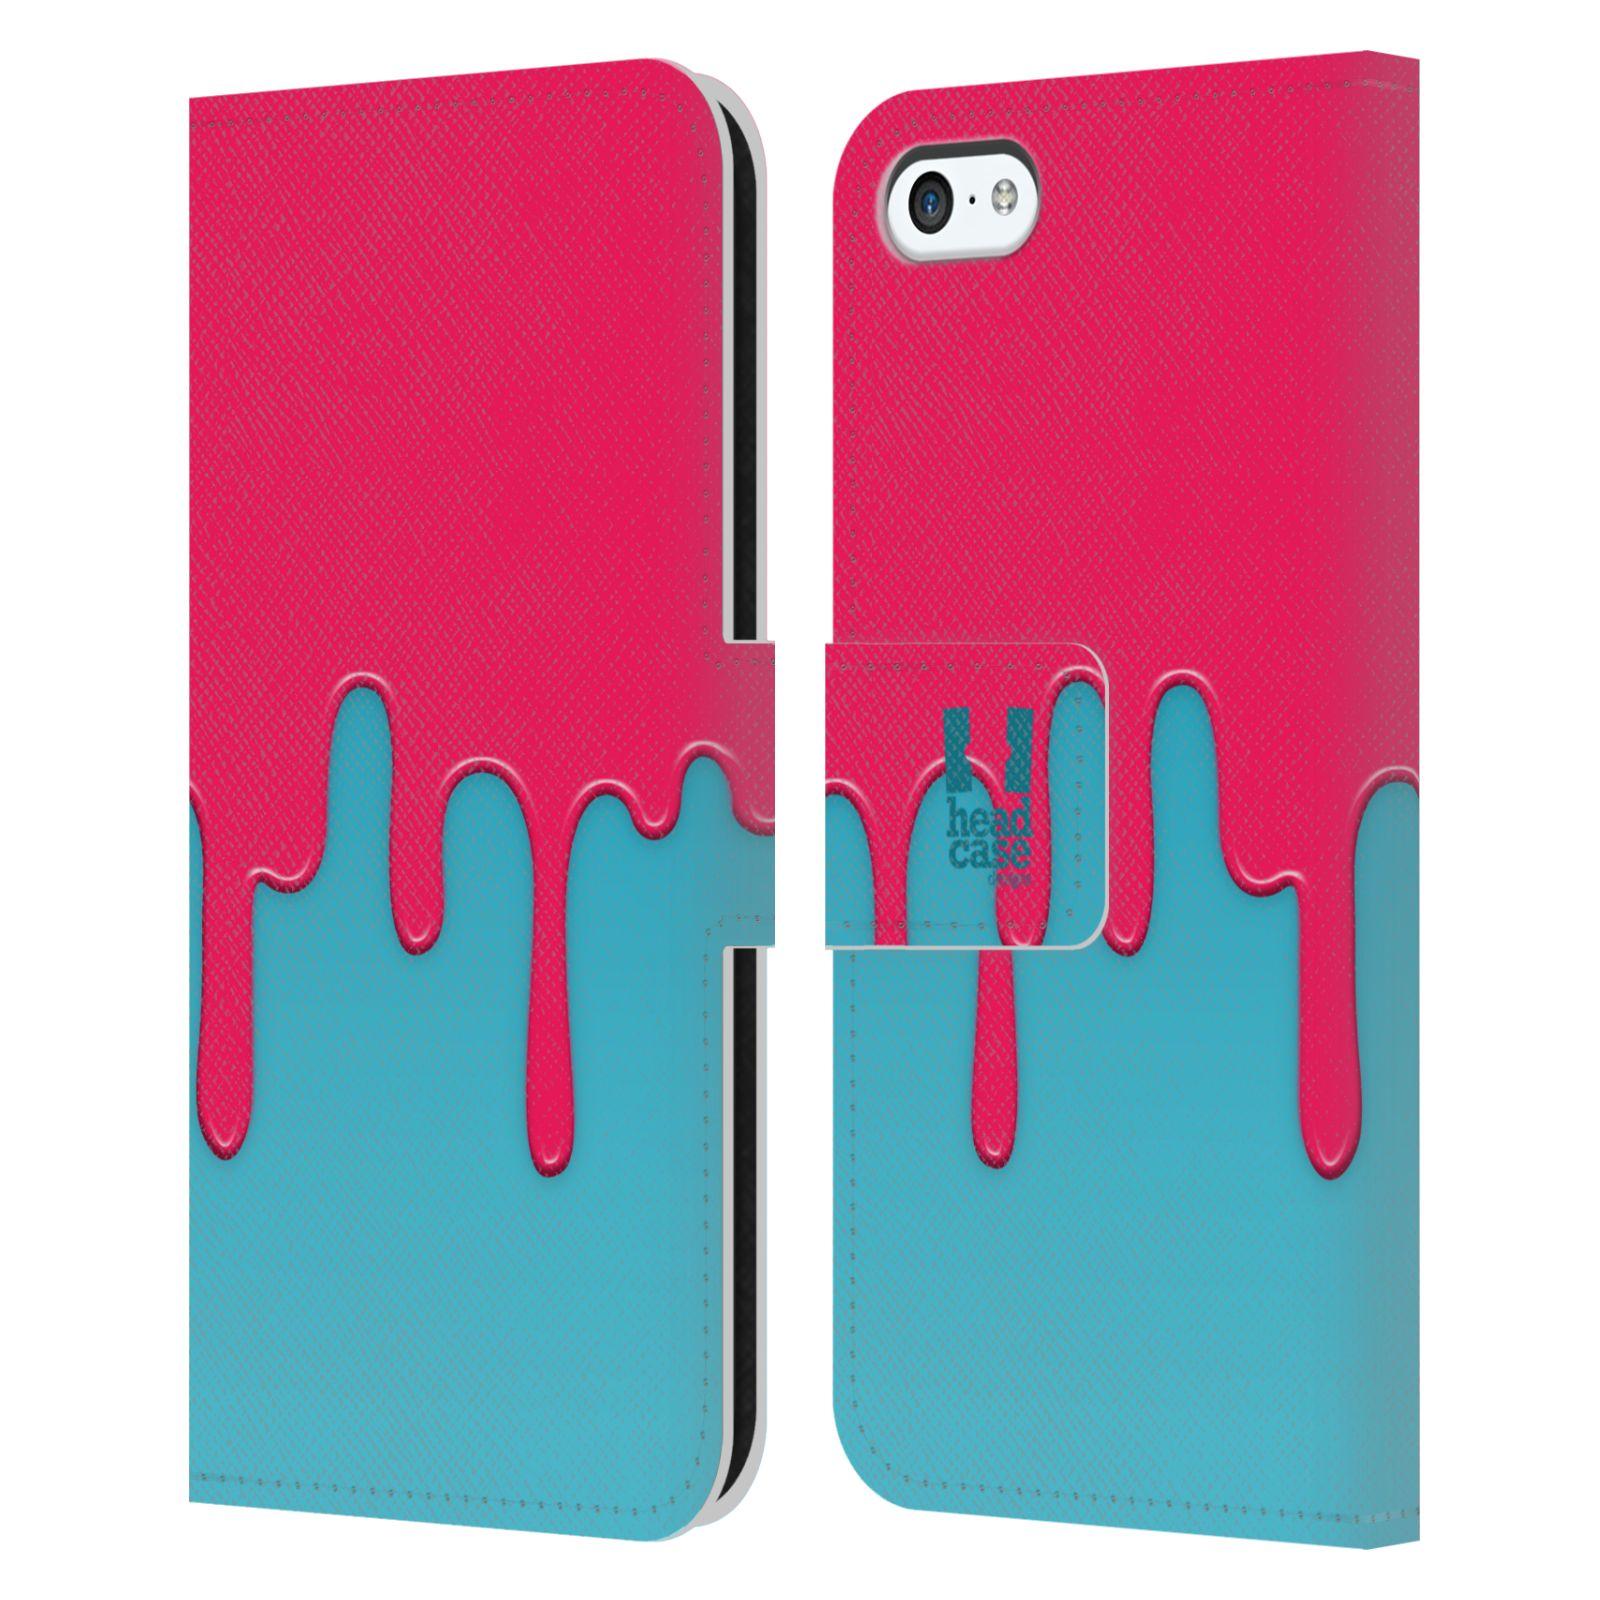 HEAD CASE Flipové pouzdro pro mobil Apple Iphone 5C Rozlitá barva růžová a modrá